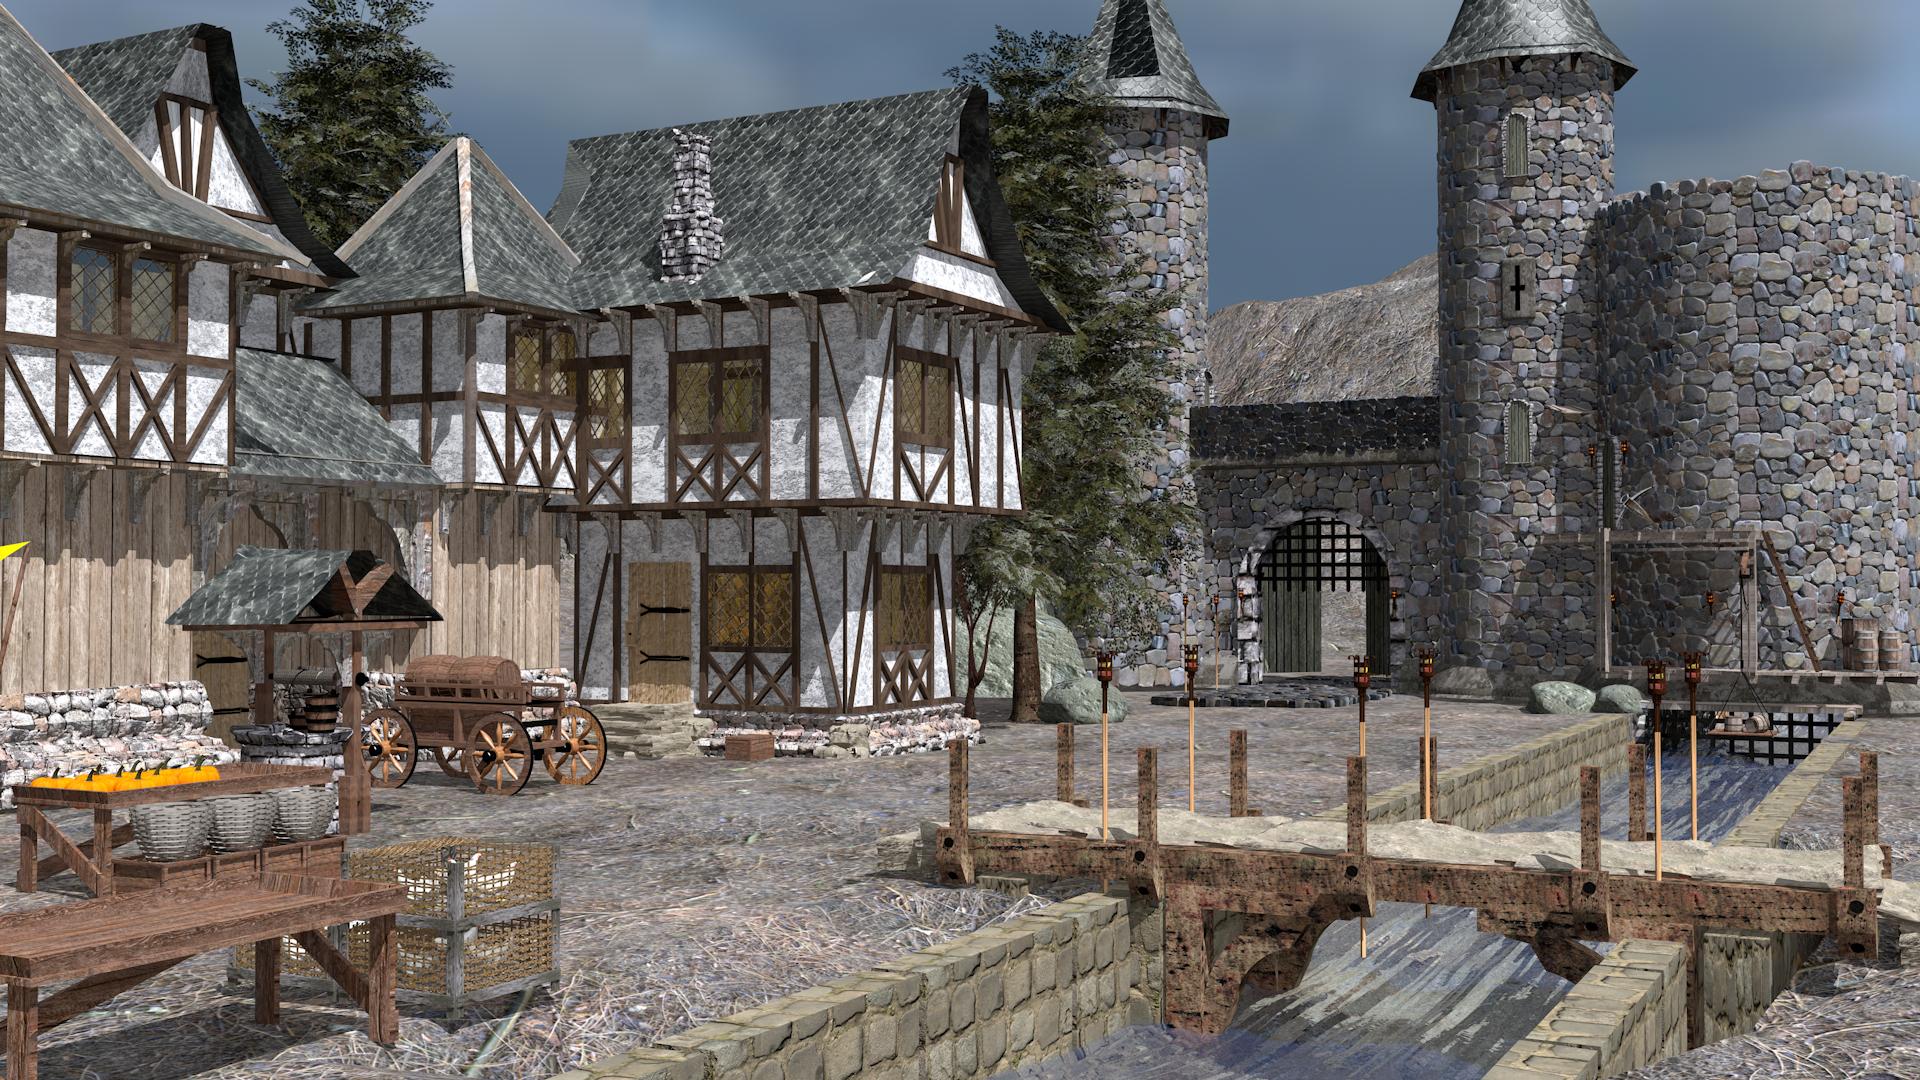 Village médiéval dans Cinema 4d maxwell render image